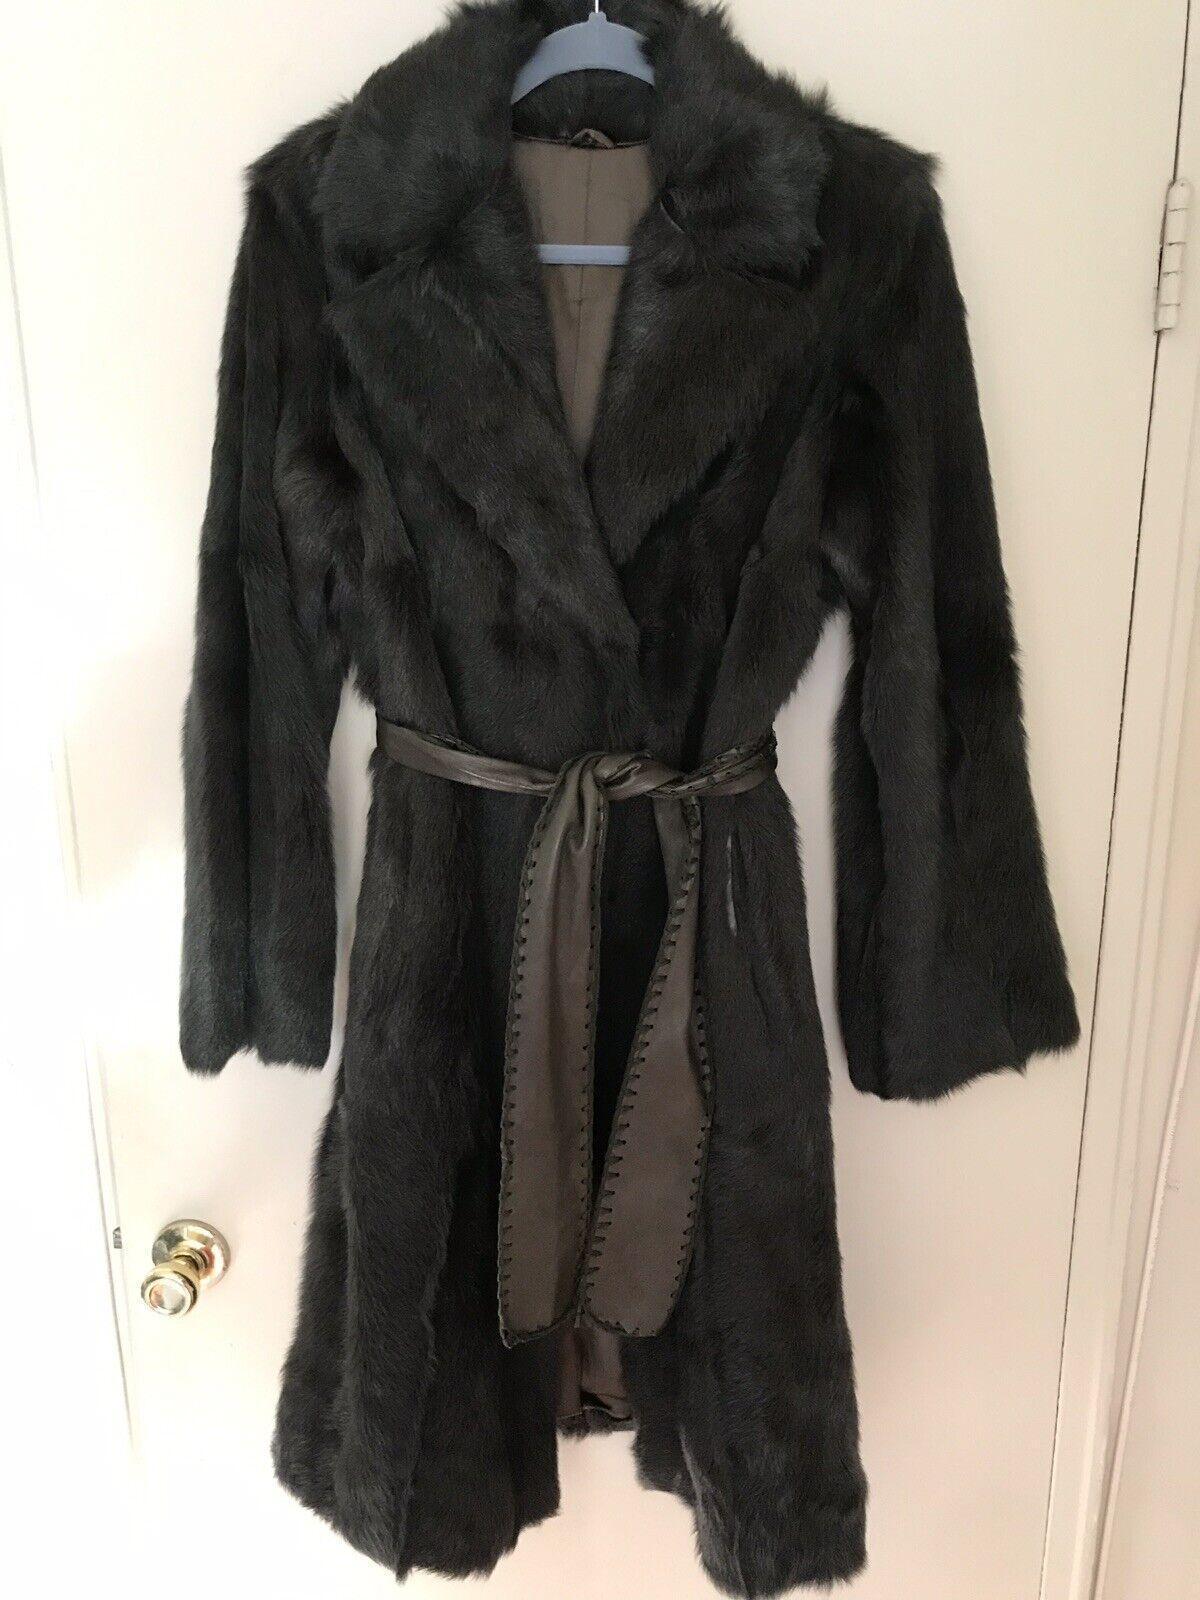 Beautiful Goat Fur Coat size 40 (Green color)